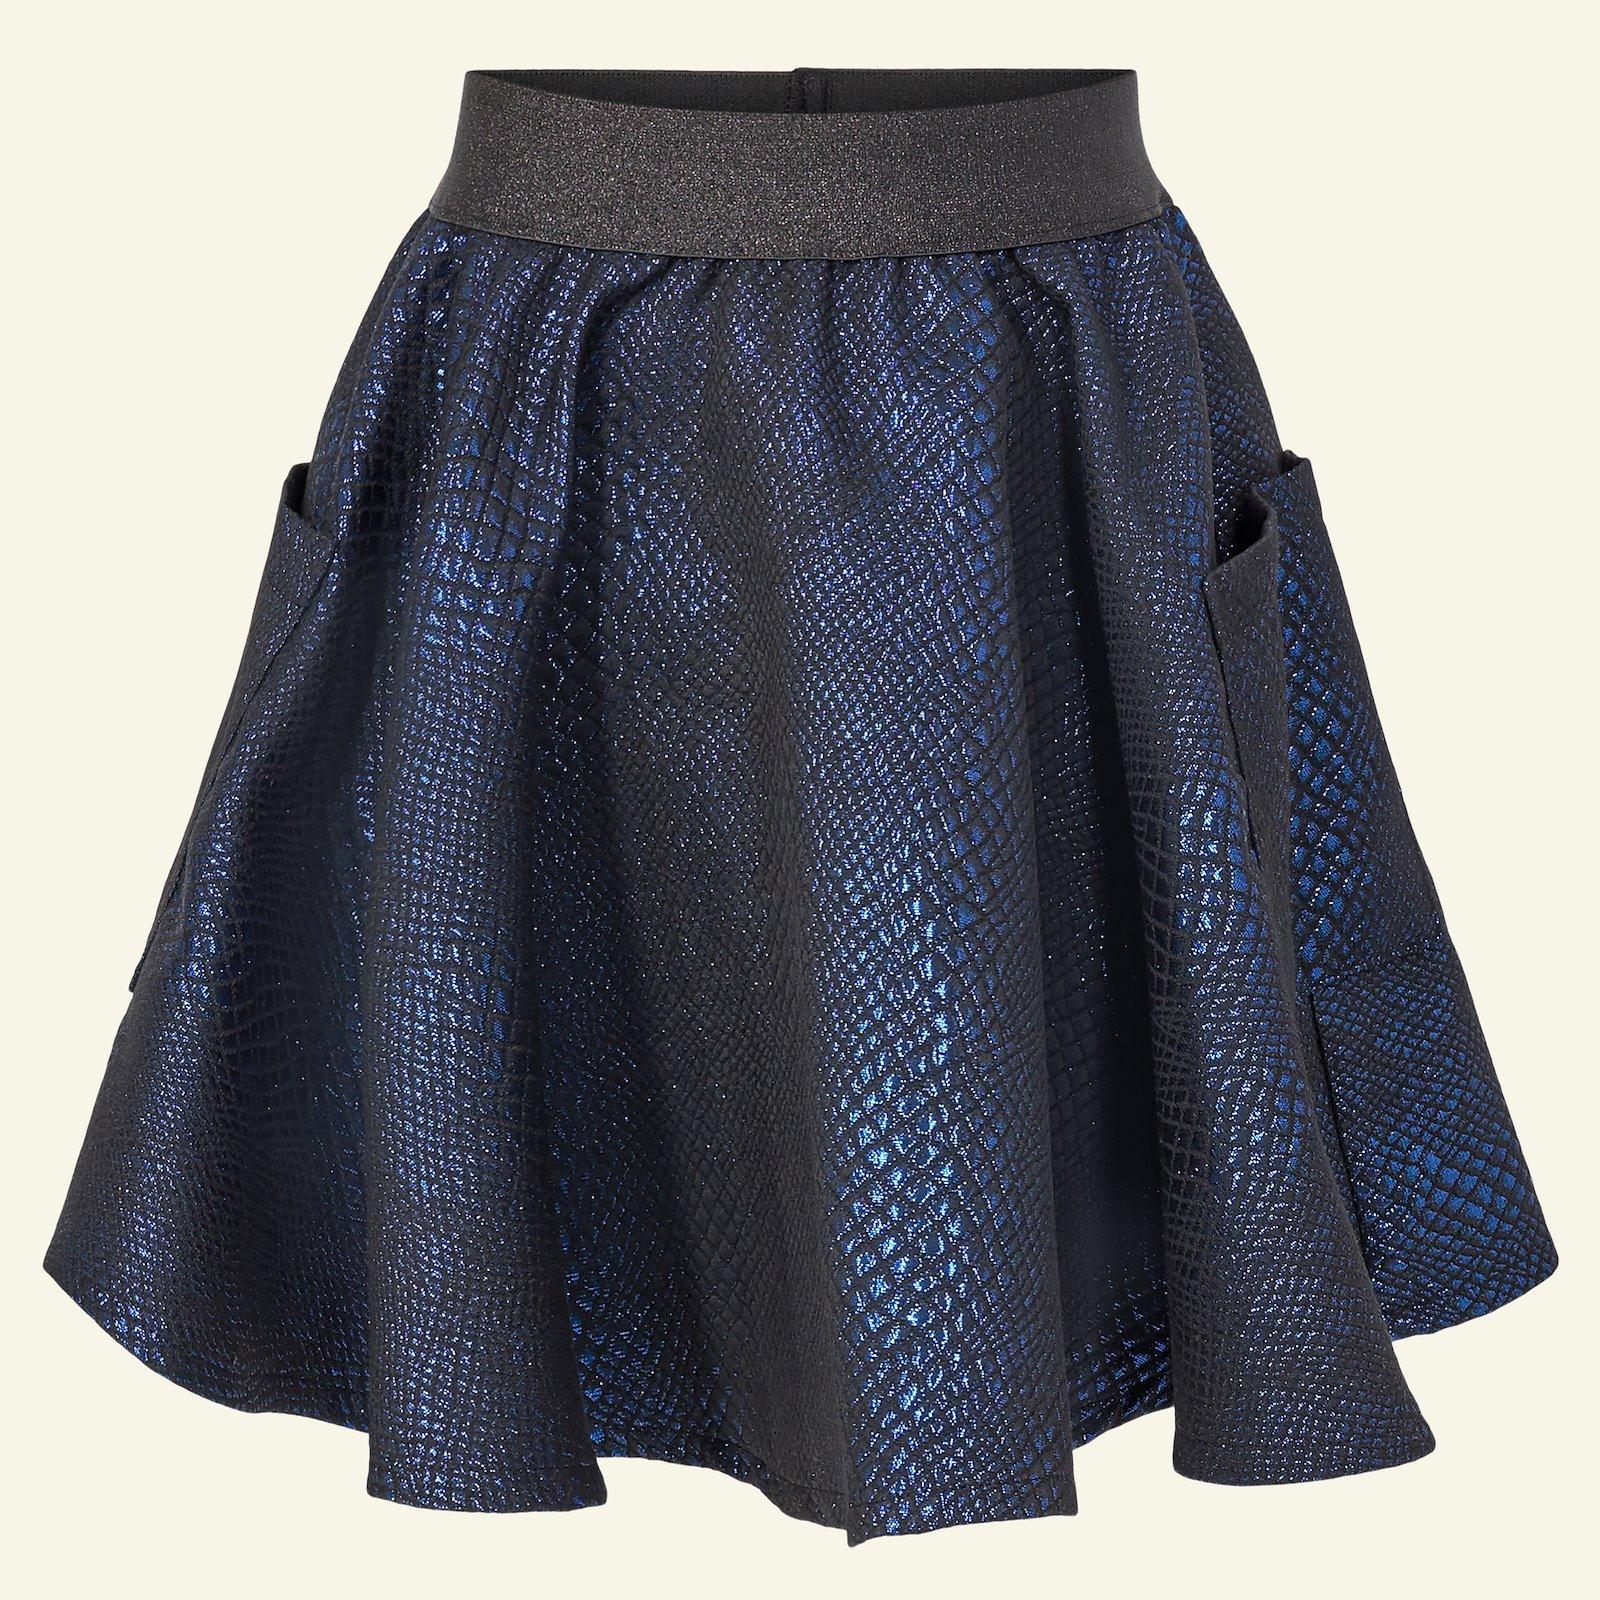 Tulle skirt, 128/8y p61018_400307_sskit